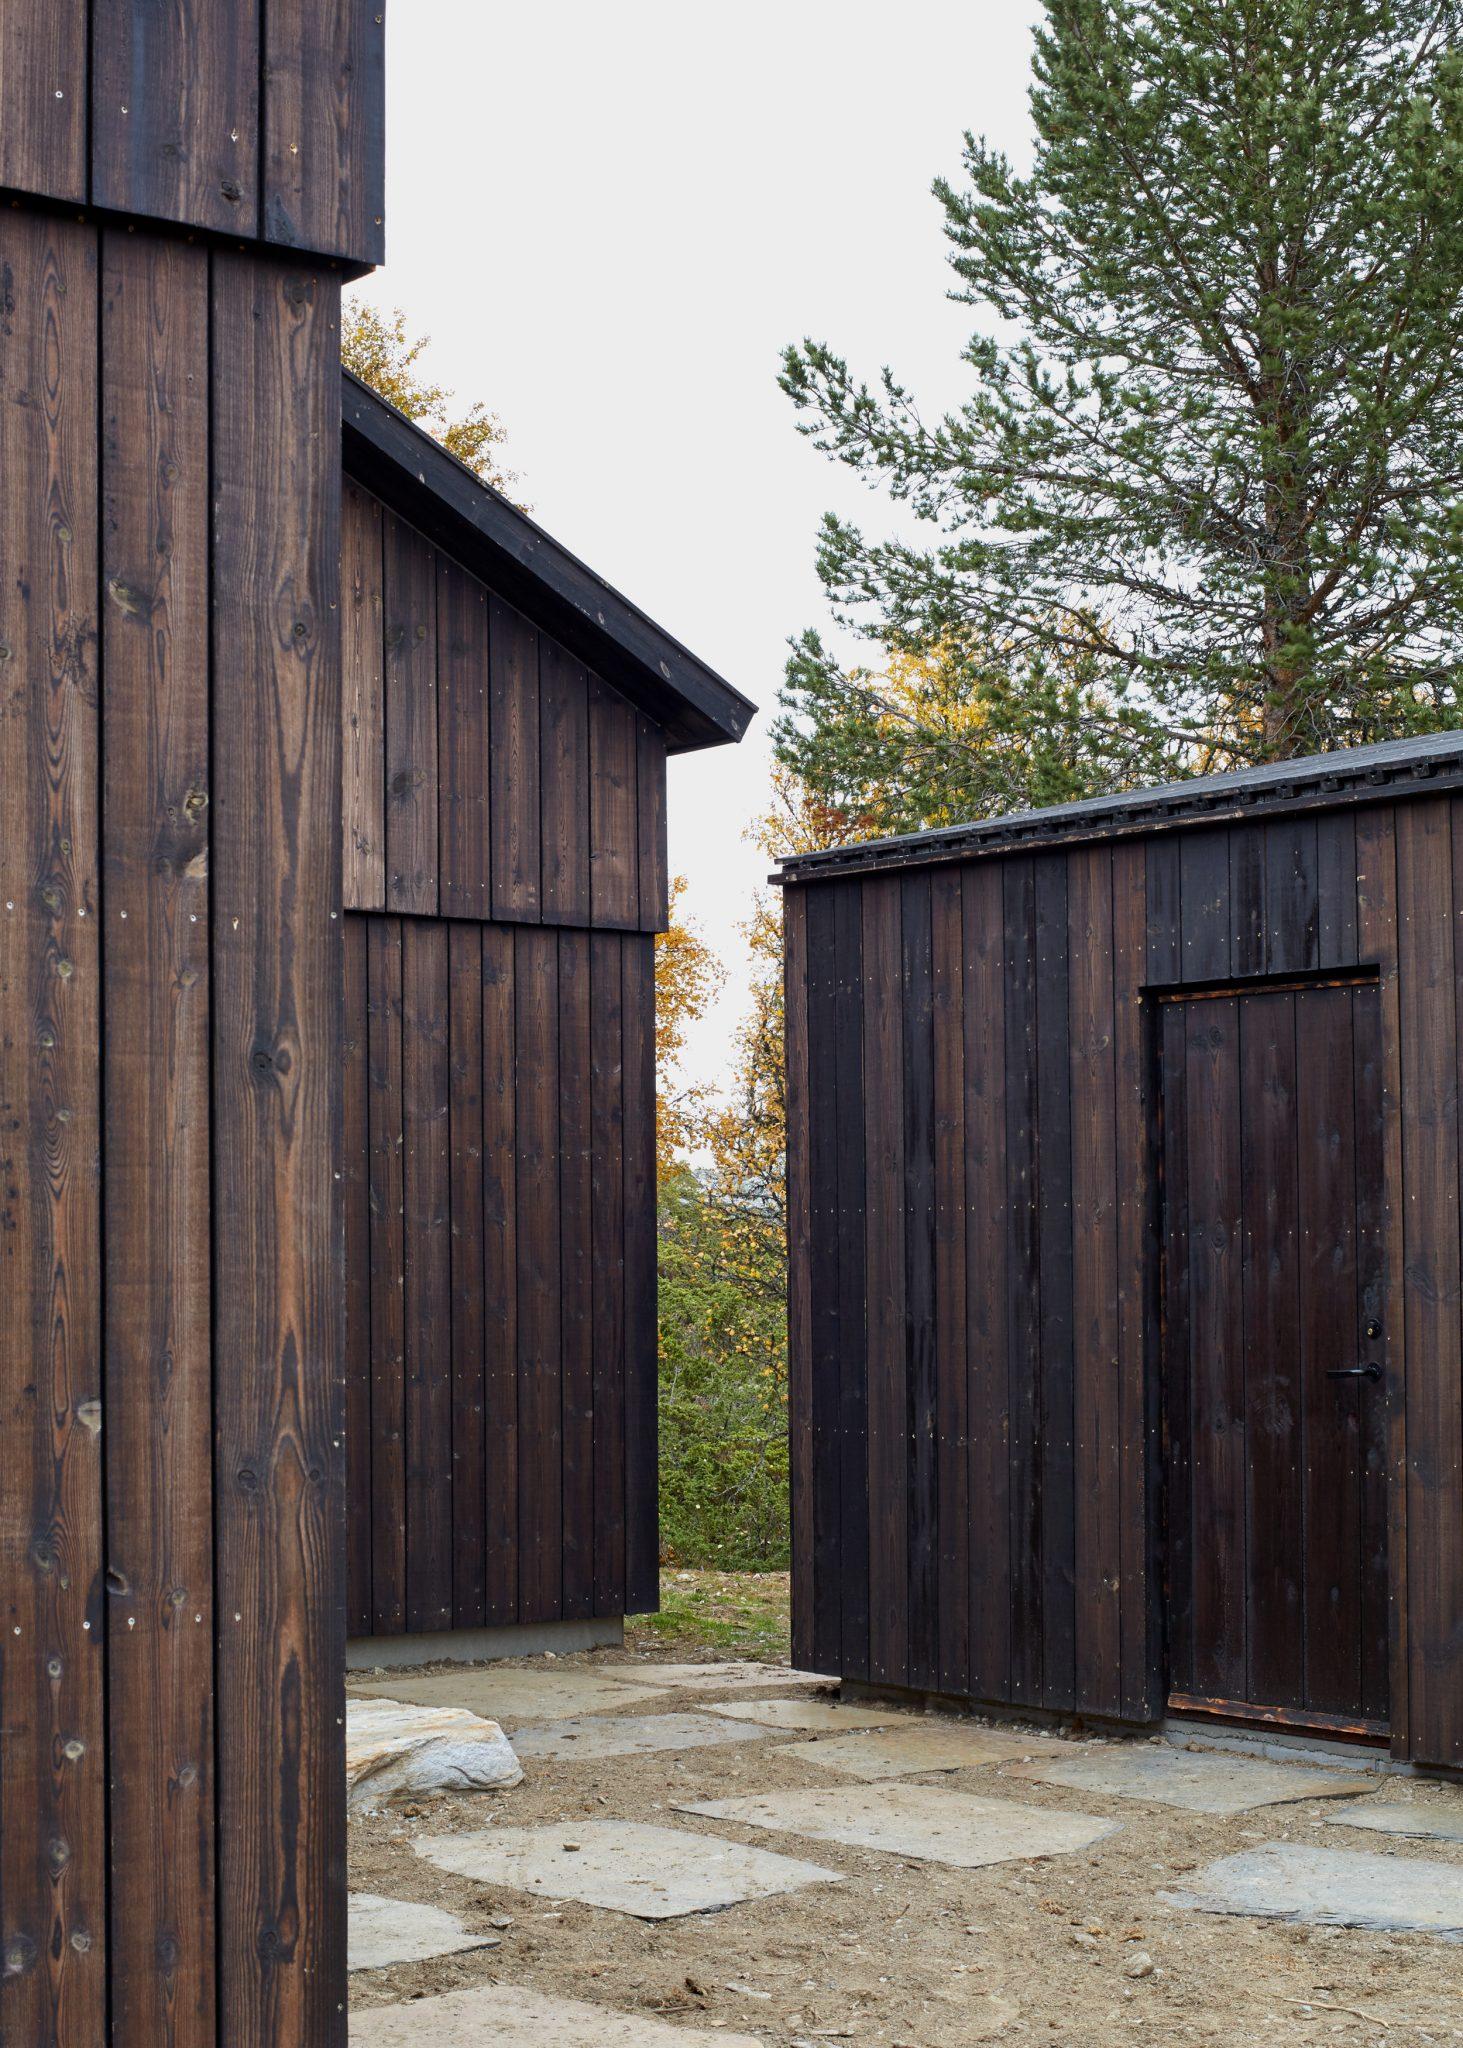 Thomas Adank - Heggesætra House, Norway by Hesselbrand